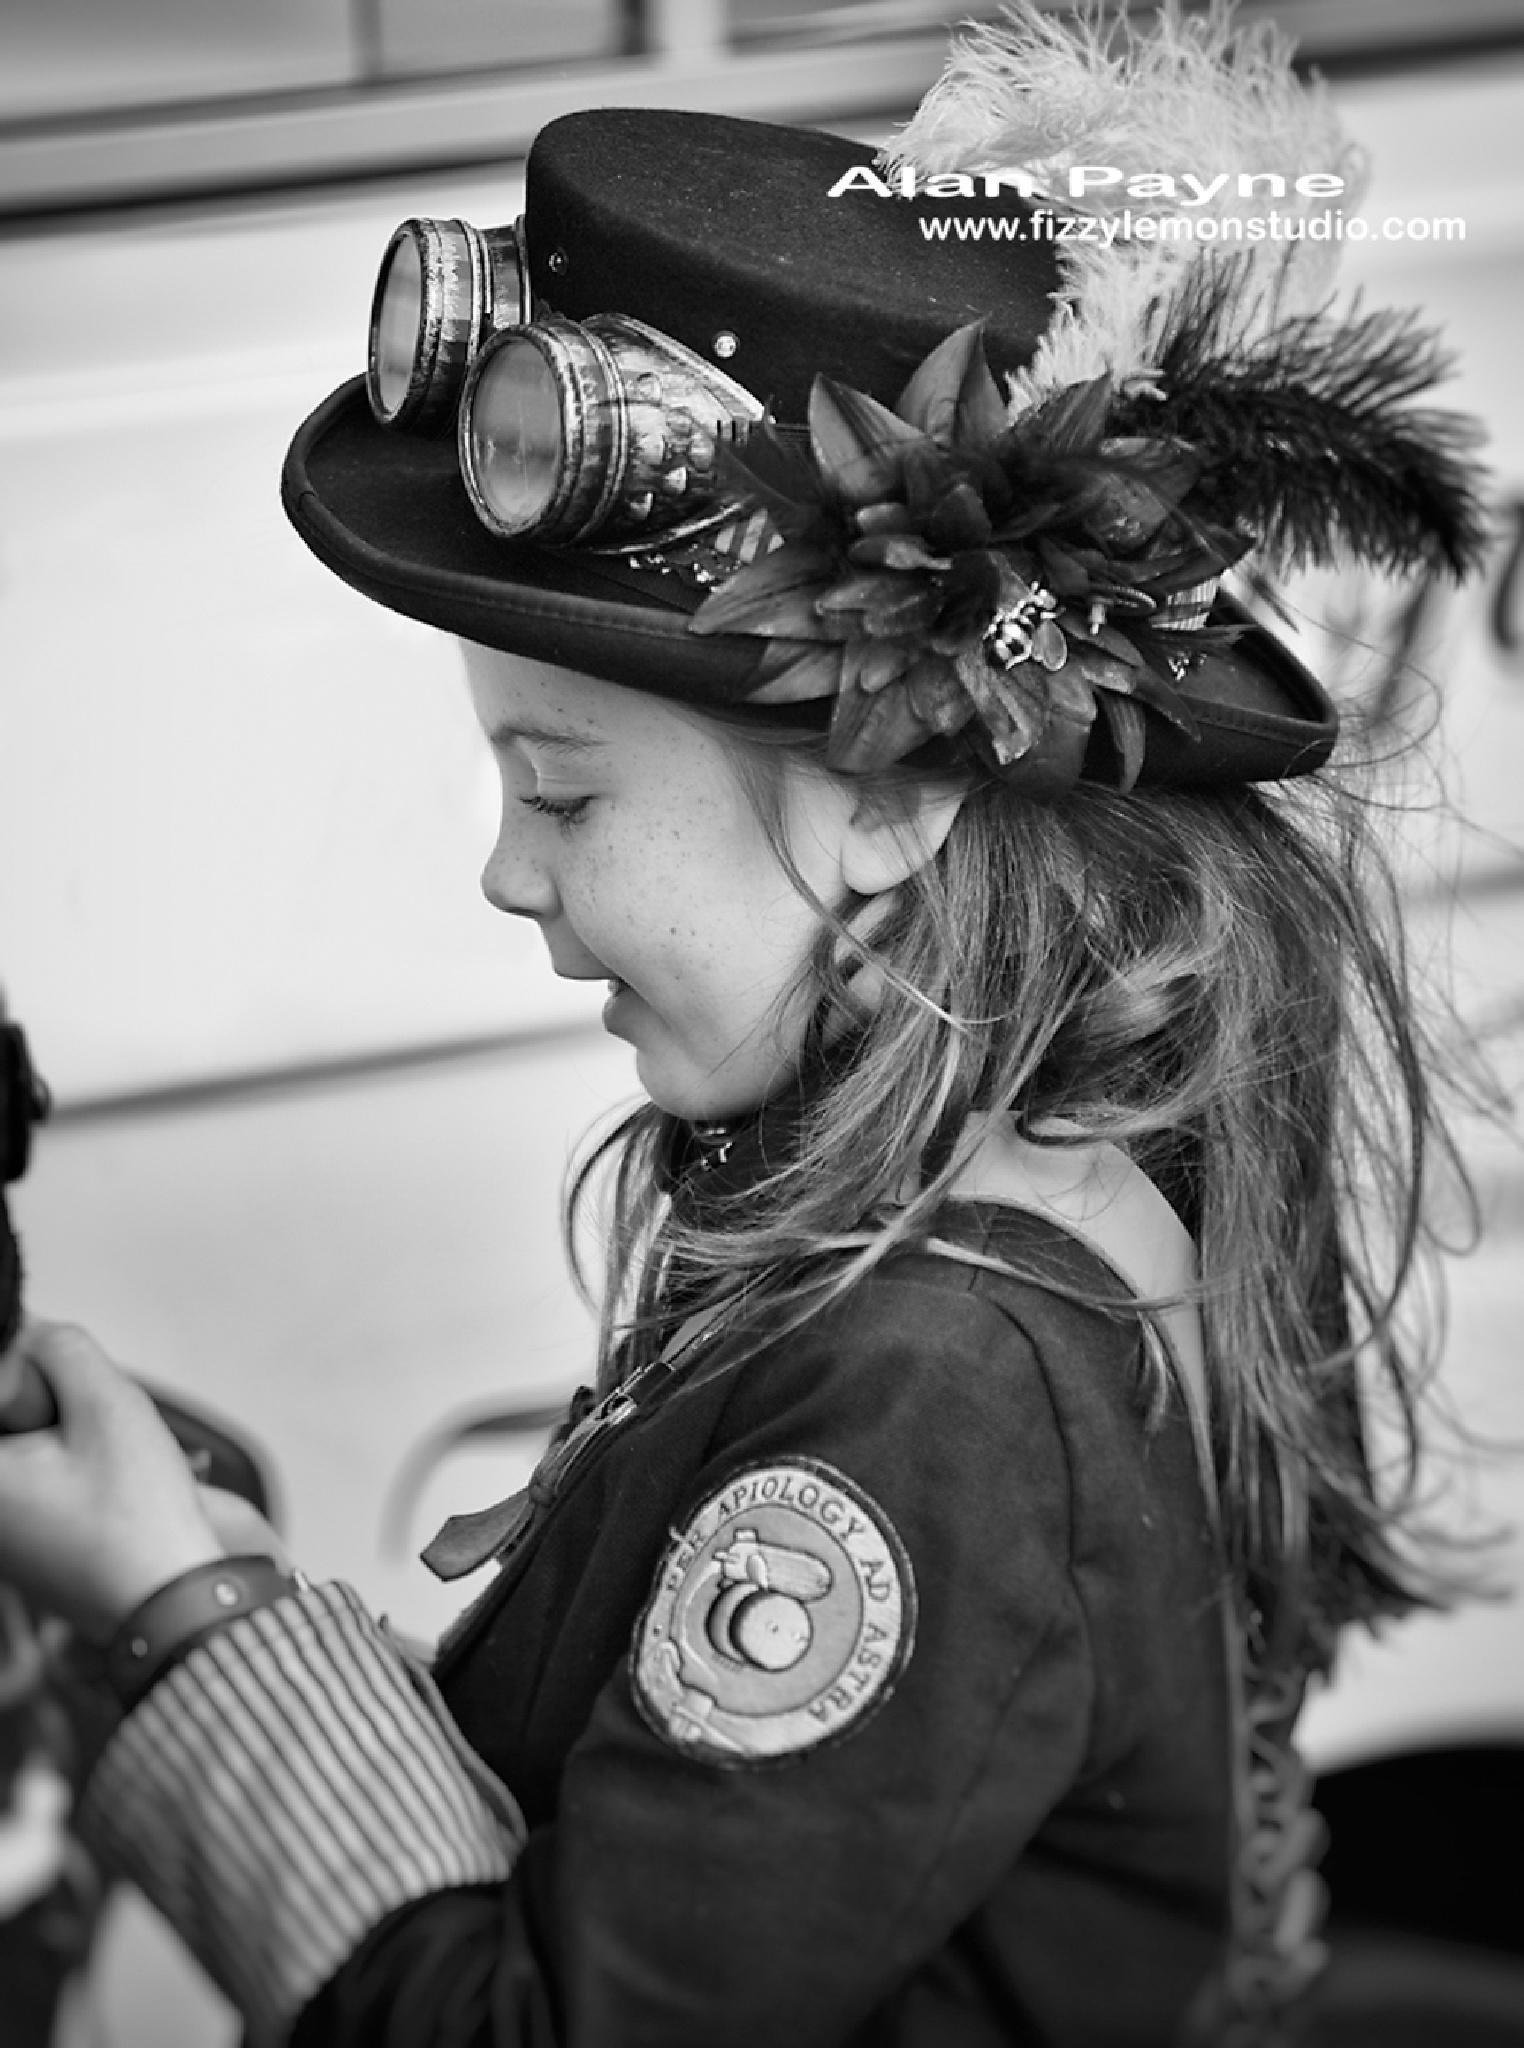 Steam punk girl by alanpayne_fizzylemonstudio